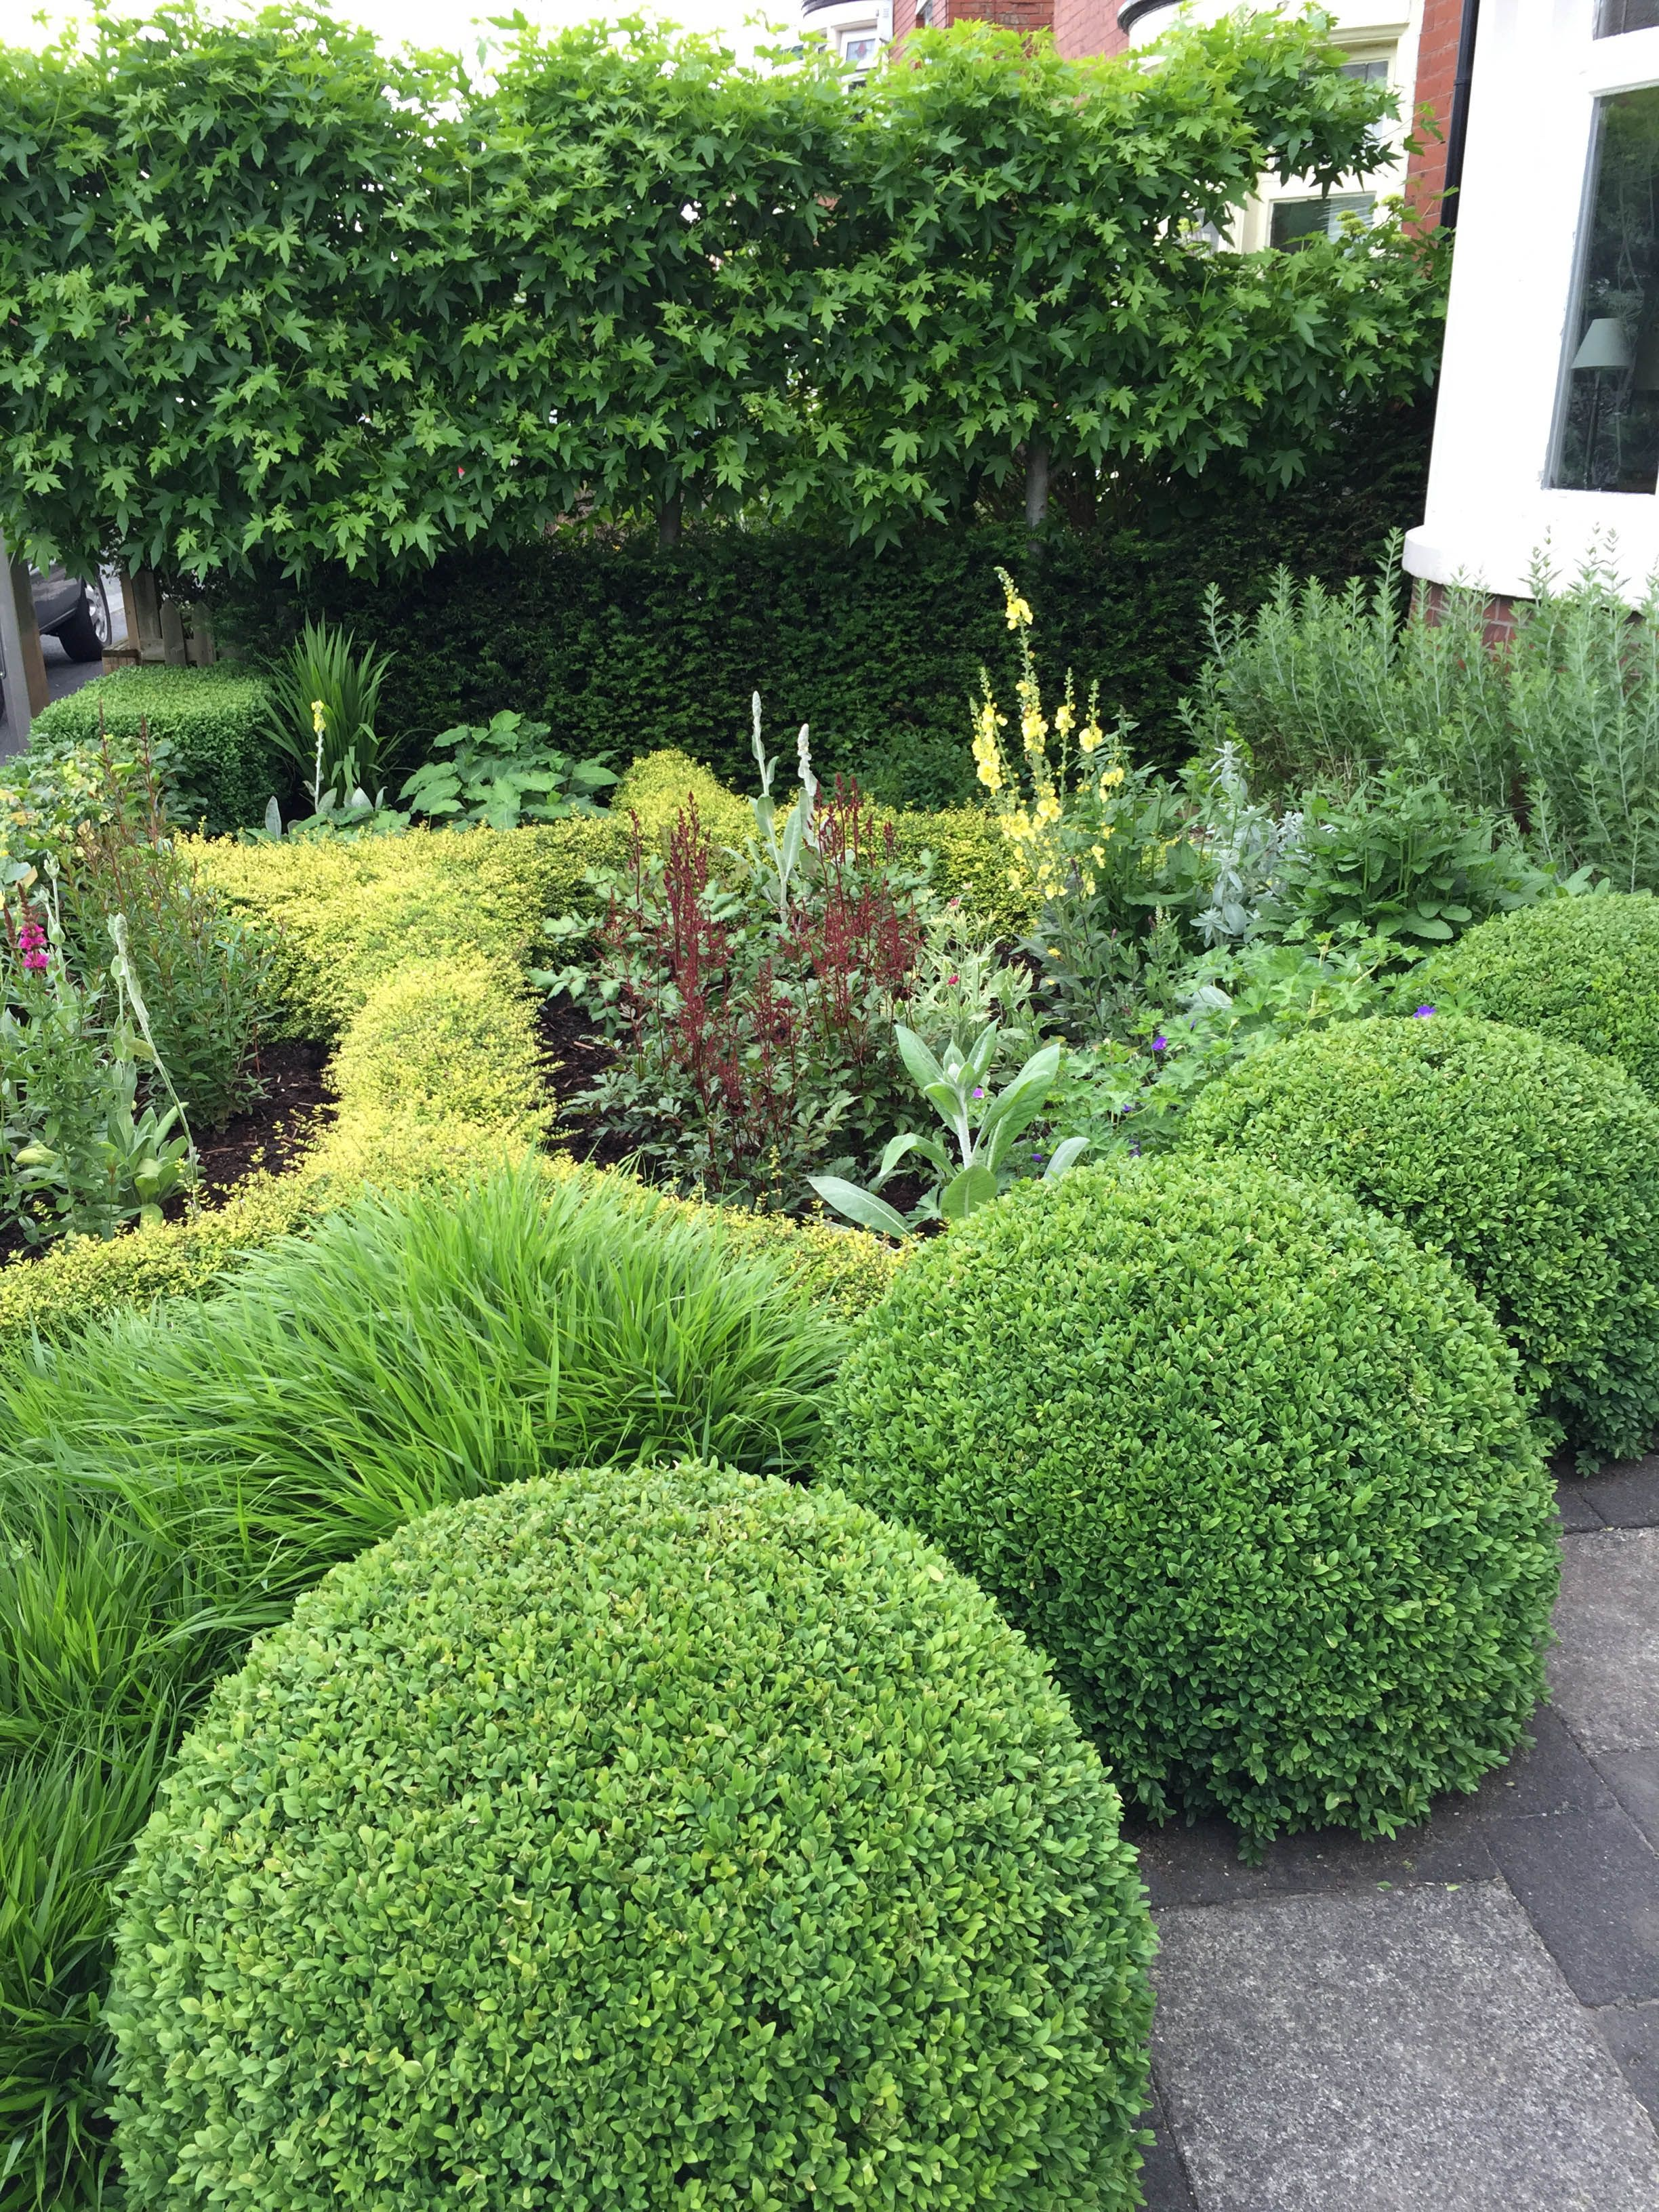 Pin de Marlene De lange en Tuin | Pinterest | Jardín